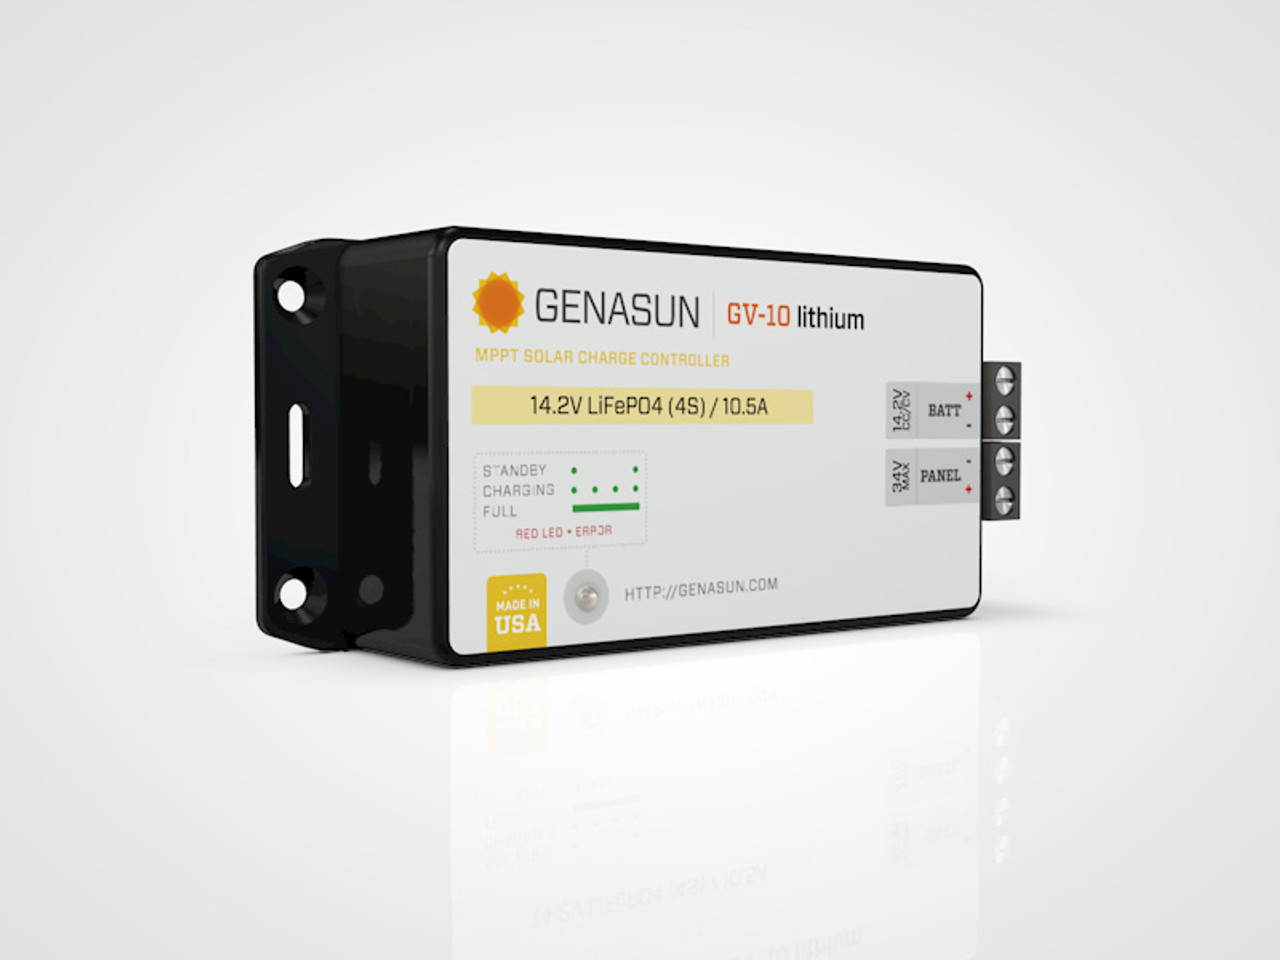 GV-10 | 140W 10.5A Genasun MPPT Solar Charge Controller - Li - Left2